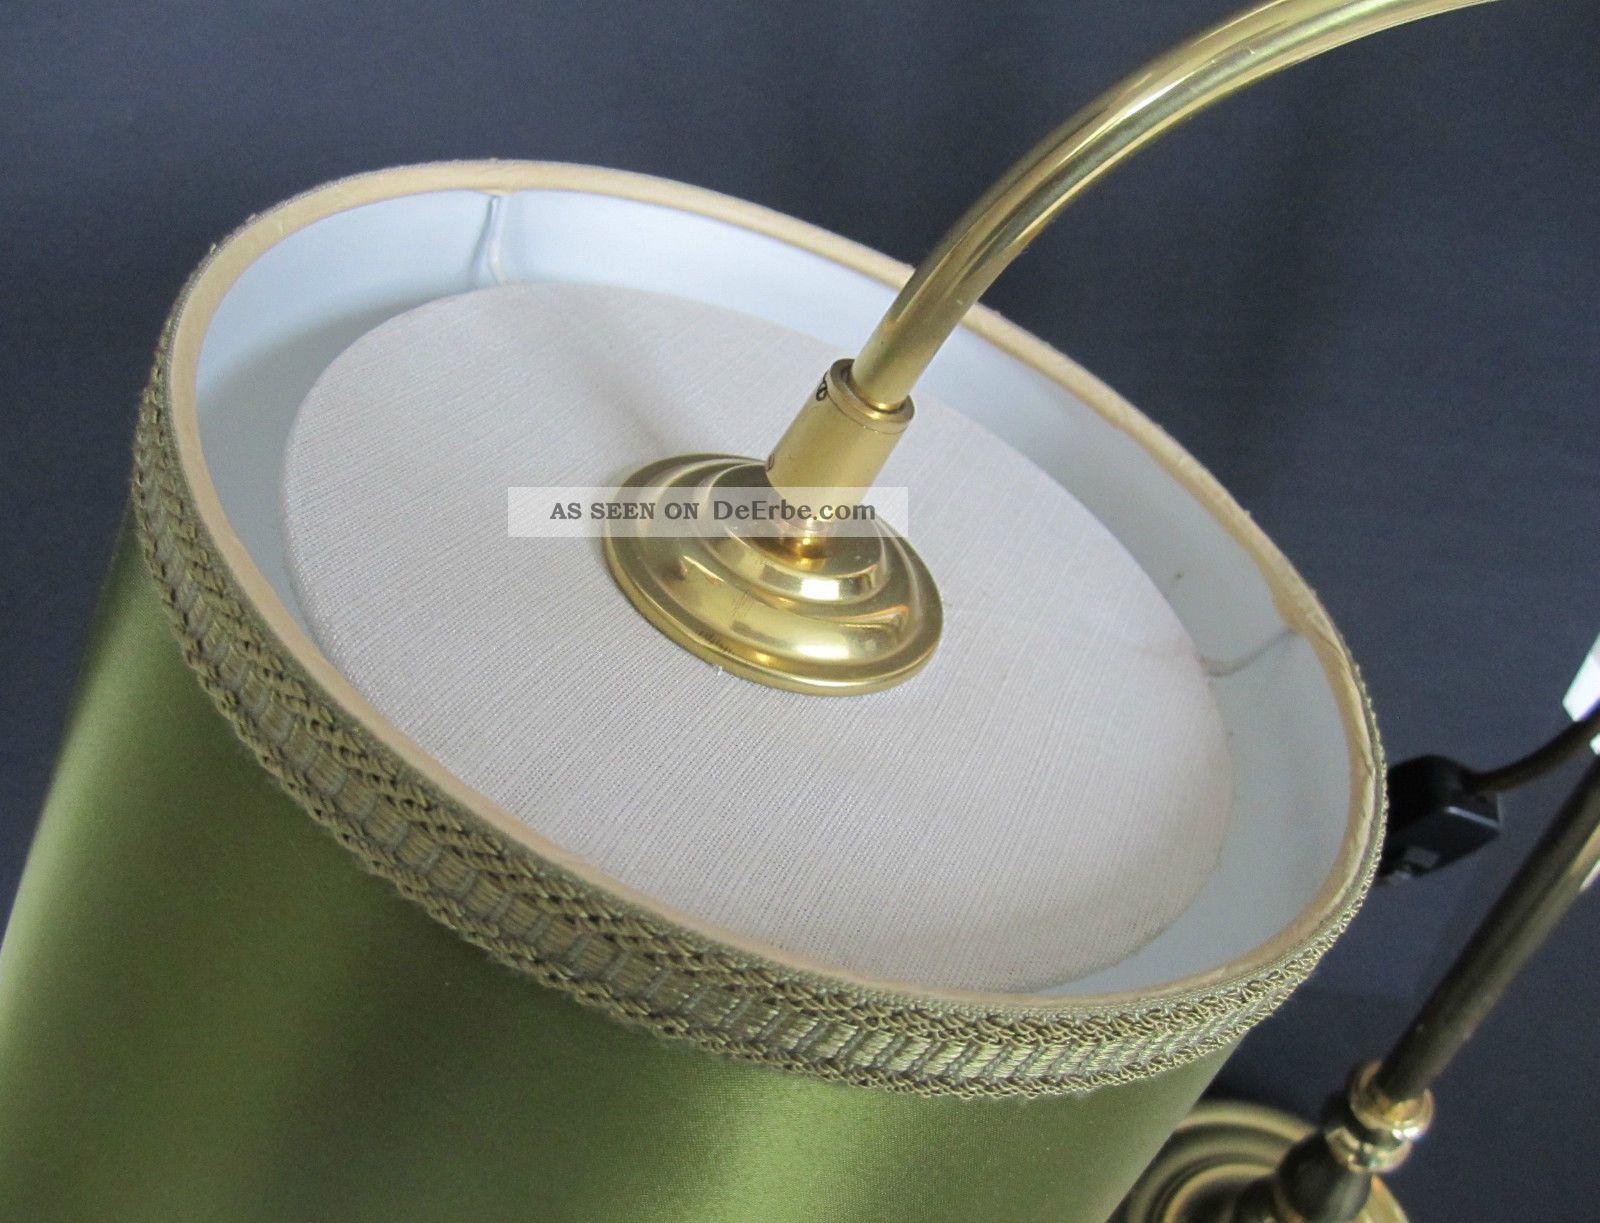 alte messinglampe tischlampe stehlampe w f messing lampe. Black Bedroom Furniture Sets. Home Design Ideas